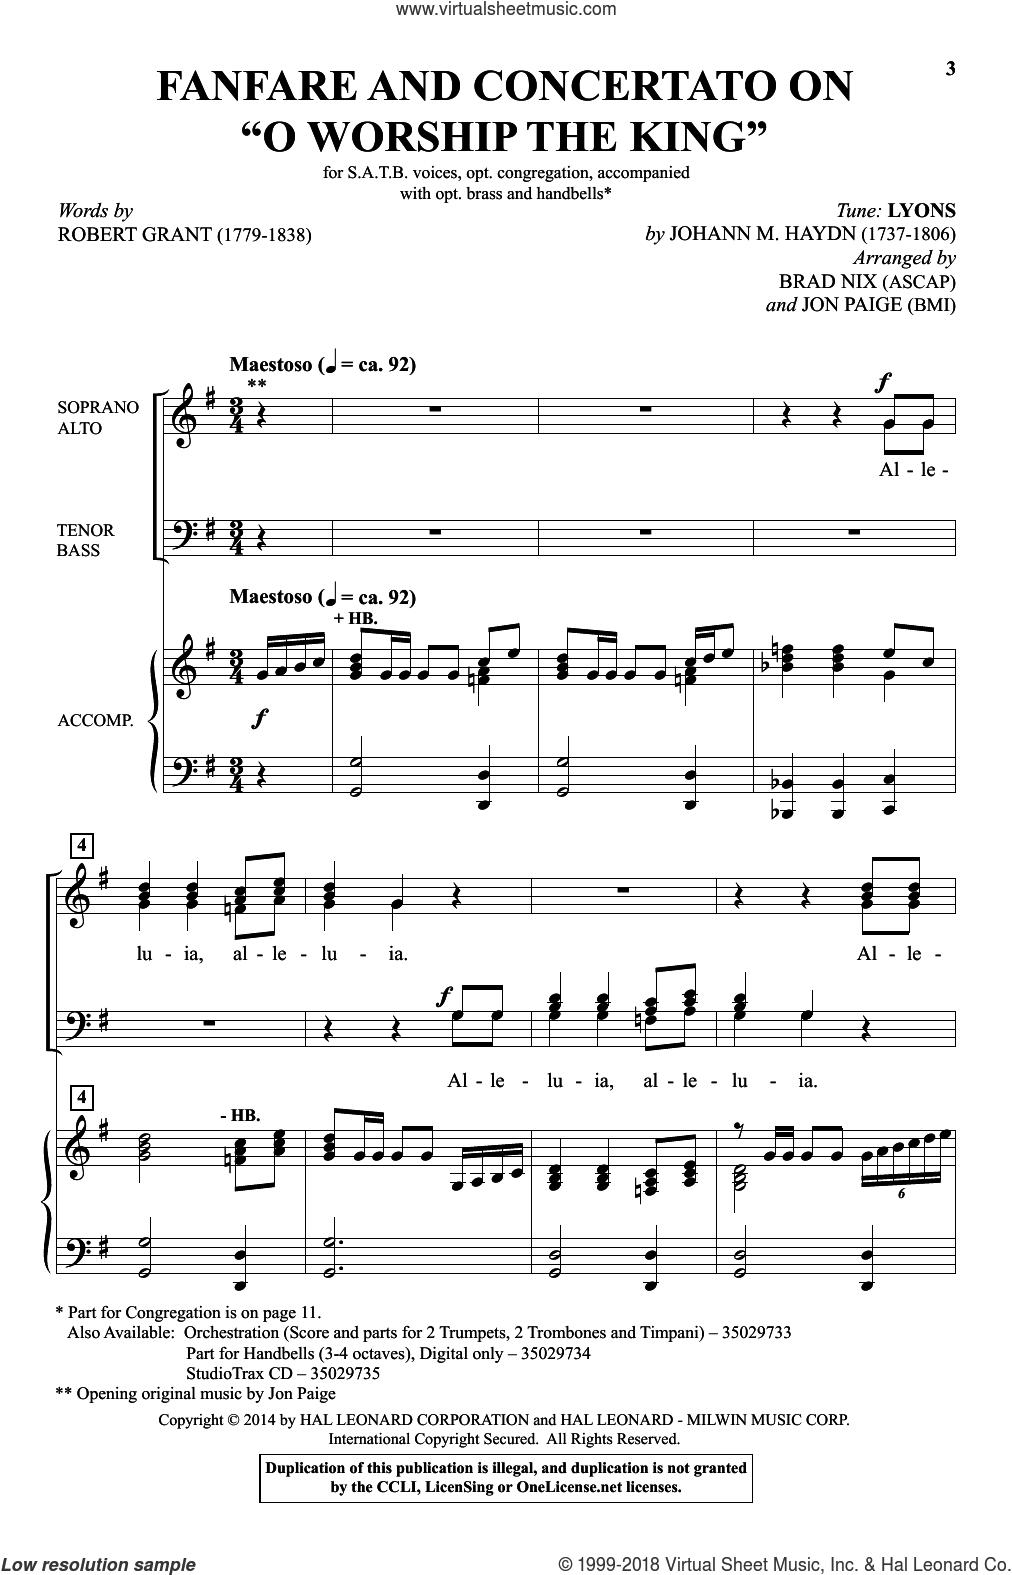 Fanfare And Concertato On 'O Worship The King' sheet music for choir (SATB: soprano, alto, tenor, bass) by Brad Nix, Johann Haydn, Johann Michael Haydn, Jon Paige and Robert Grant, intermediate skill level